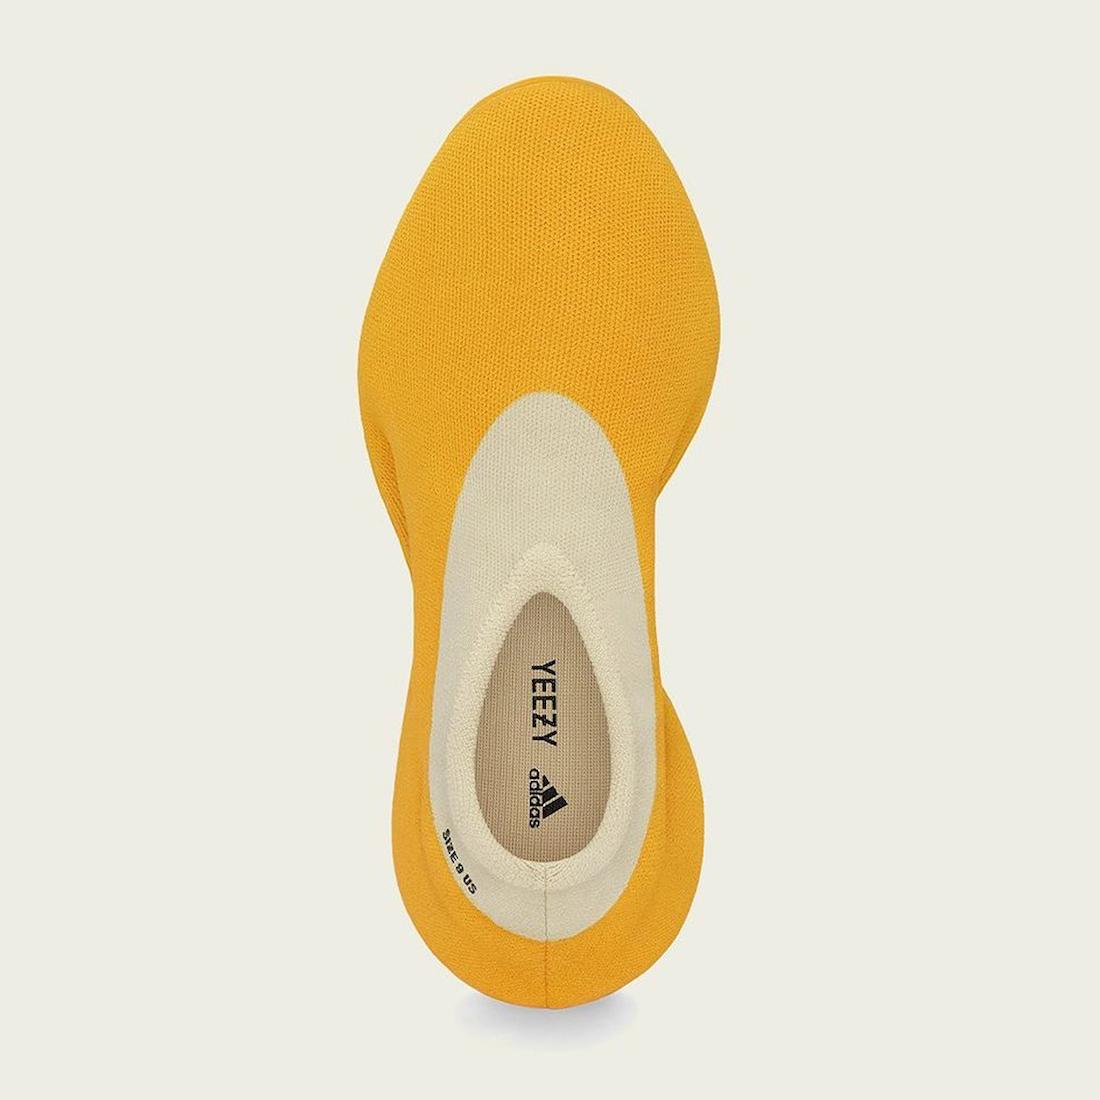 Adidas Yeezy Knit Runner